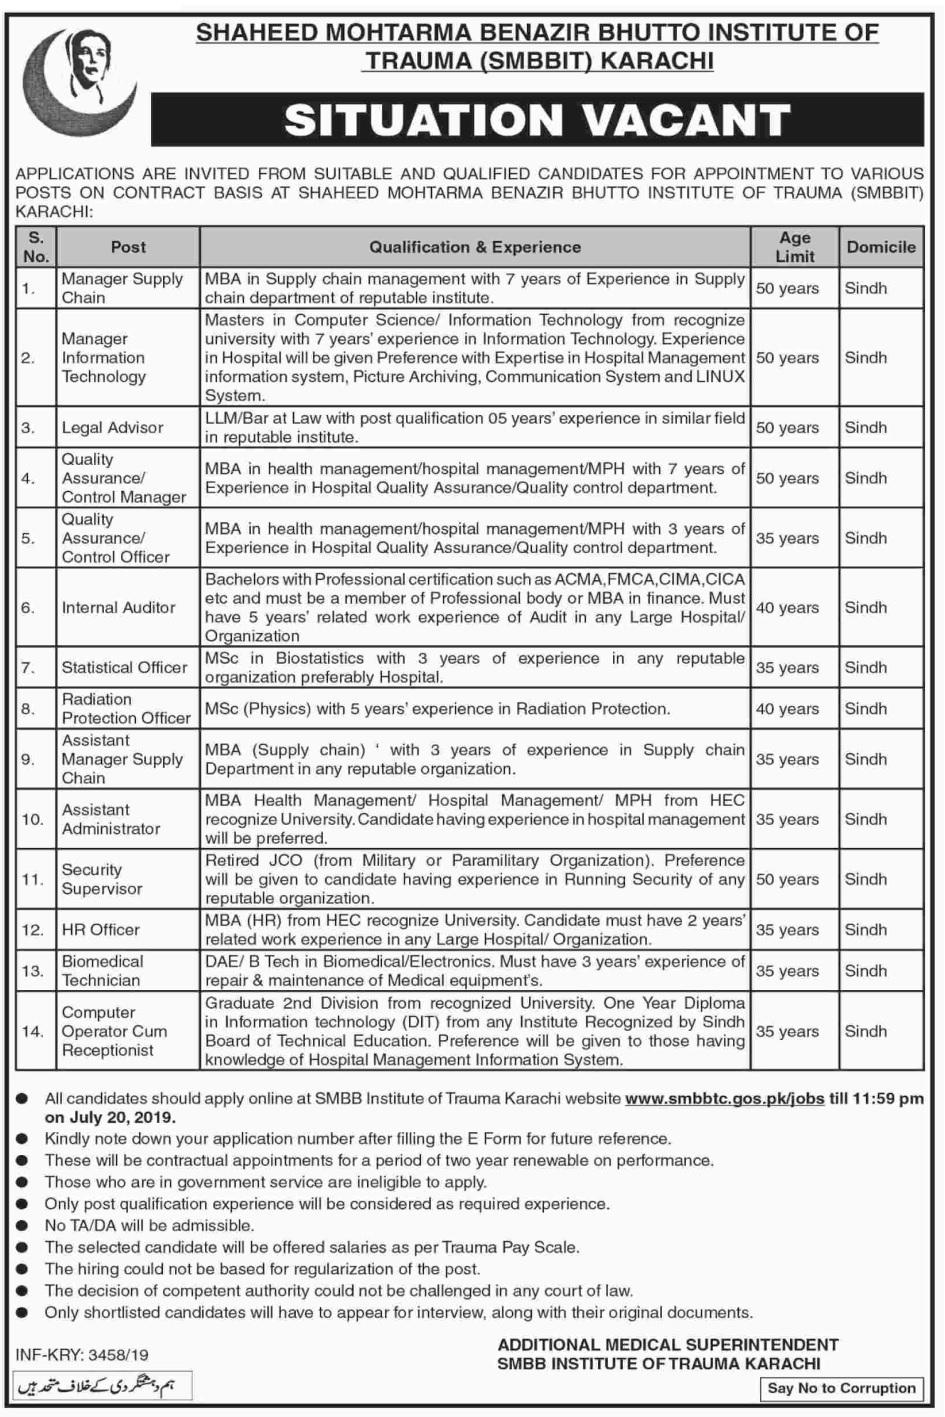 SMMB Institute of Trauma (SMMBIT) Karachi Jobs 2019 Apply Online